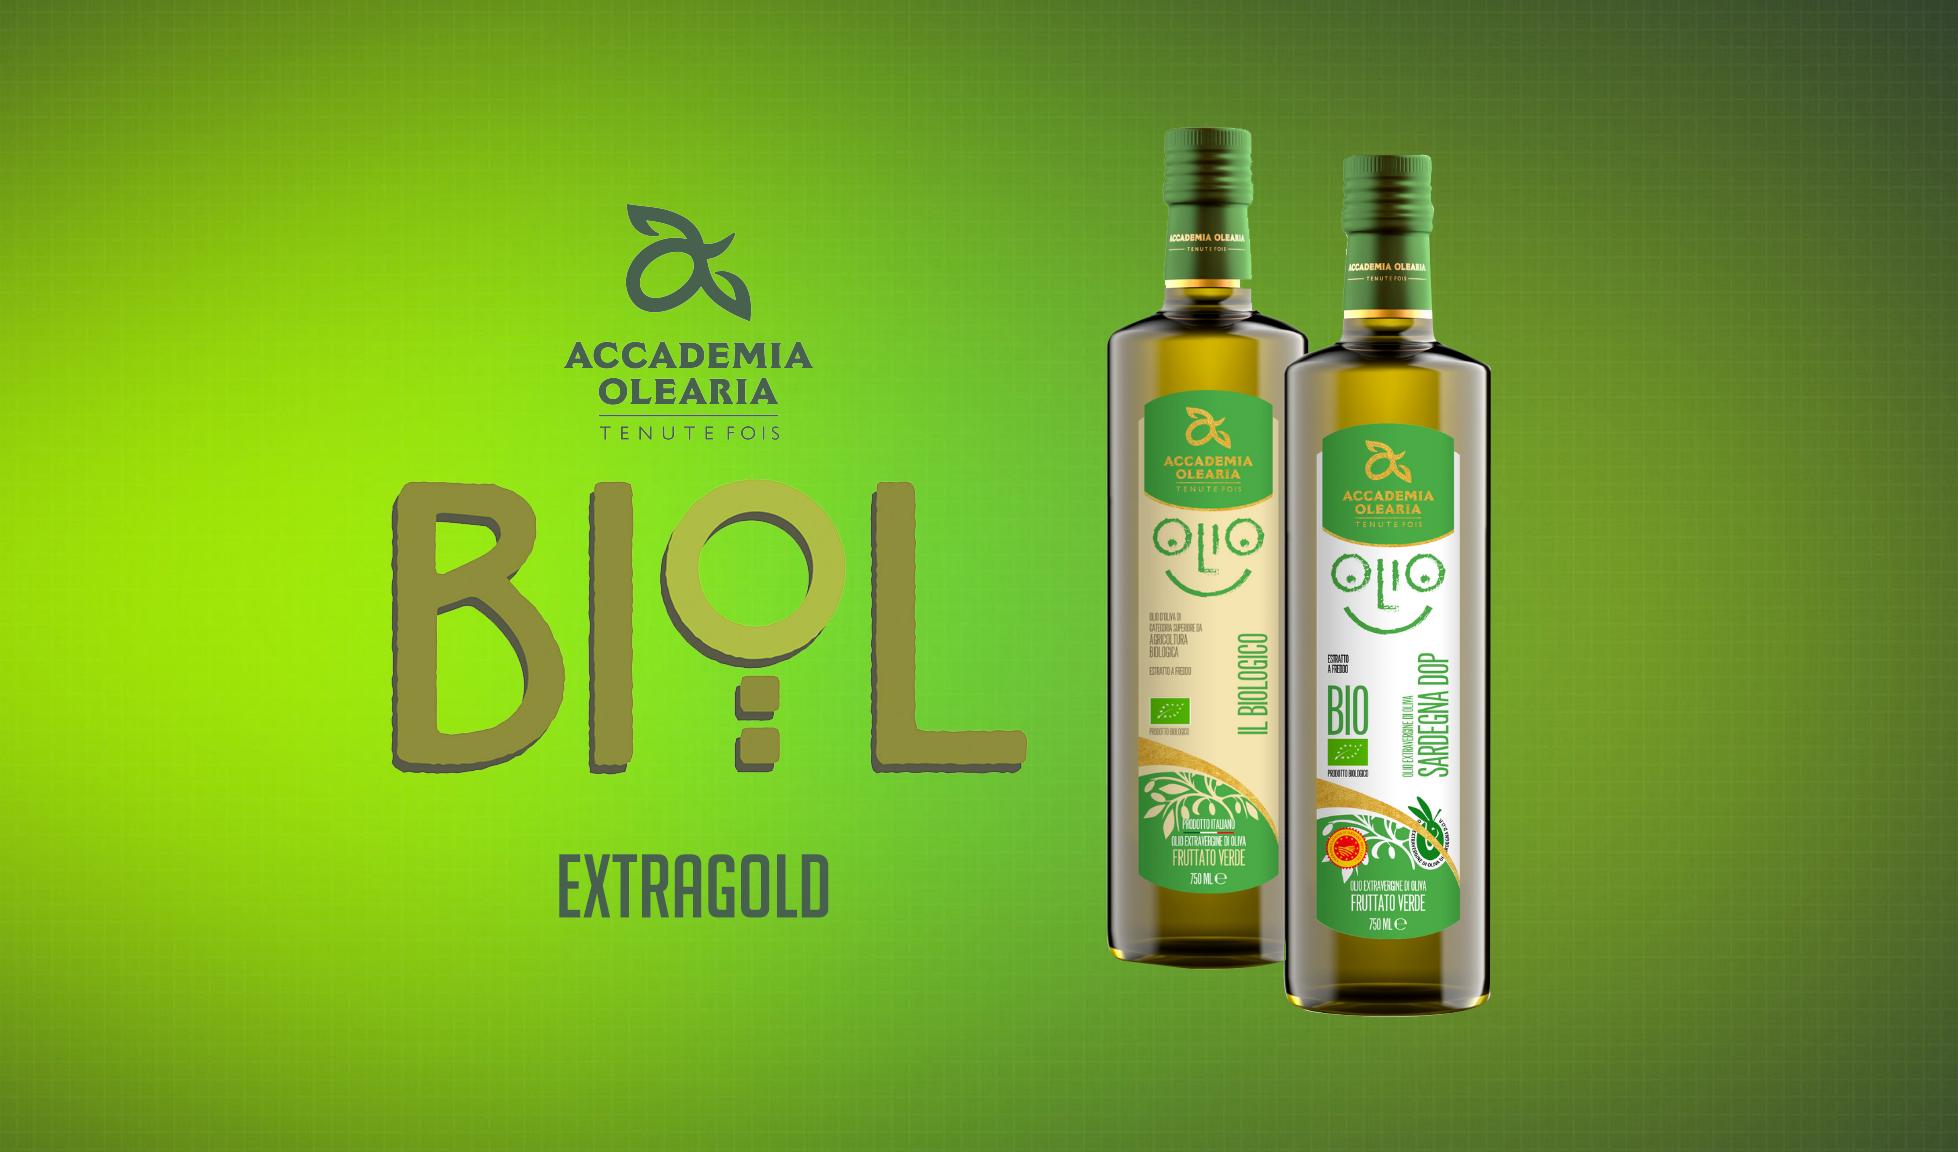 Olio Accademia Olearia Alghero premiati a Biol